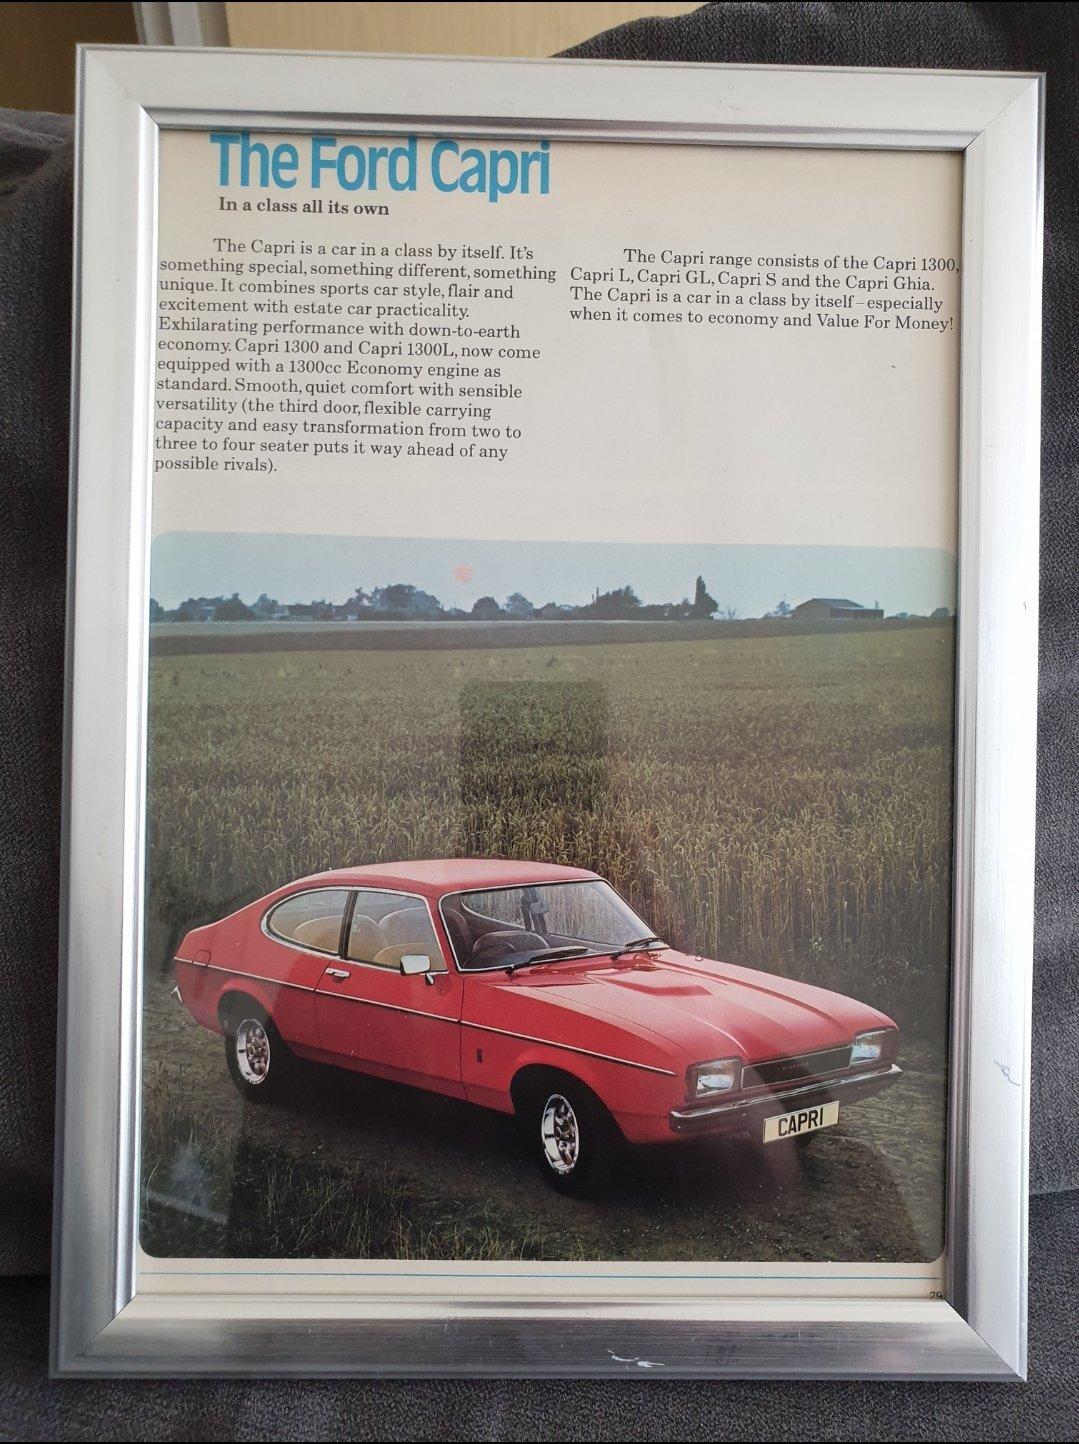 1976 Ford Capri MK2 Framed Advert Original  For Sale (picture 1 of 2)